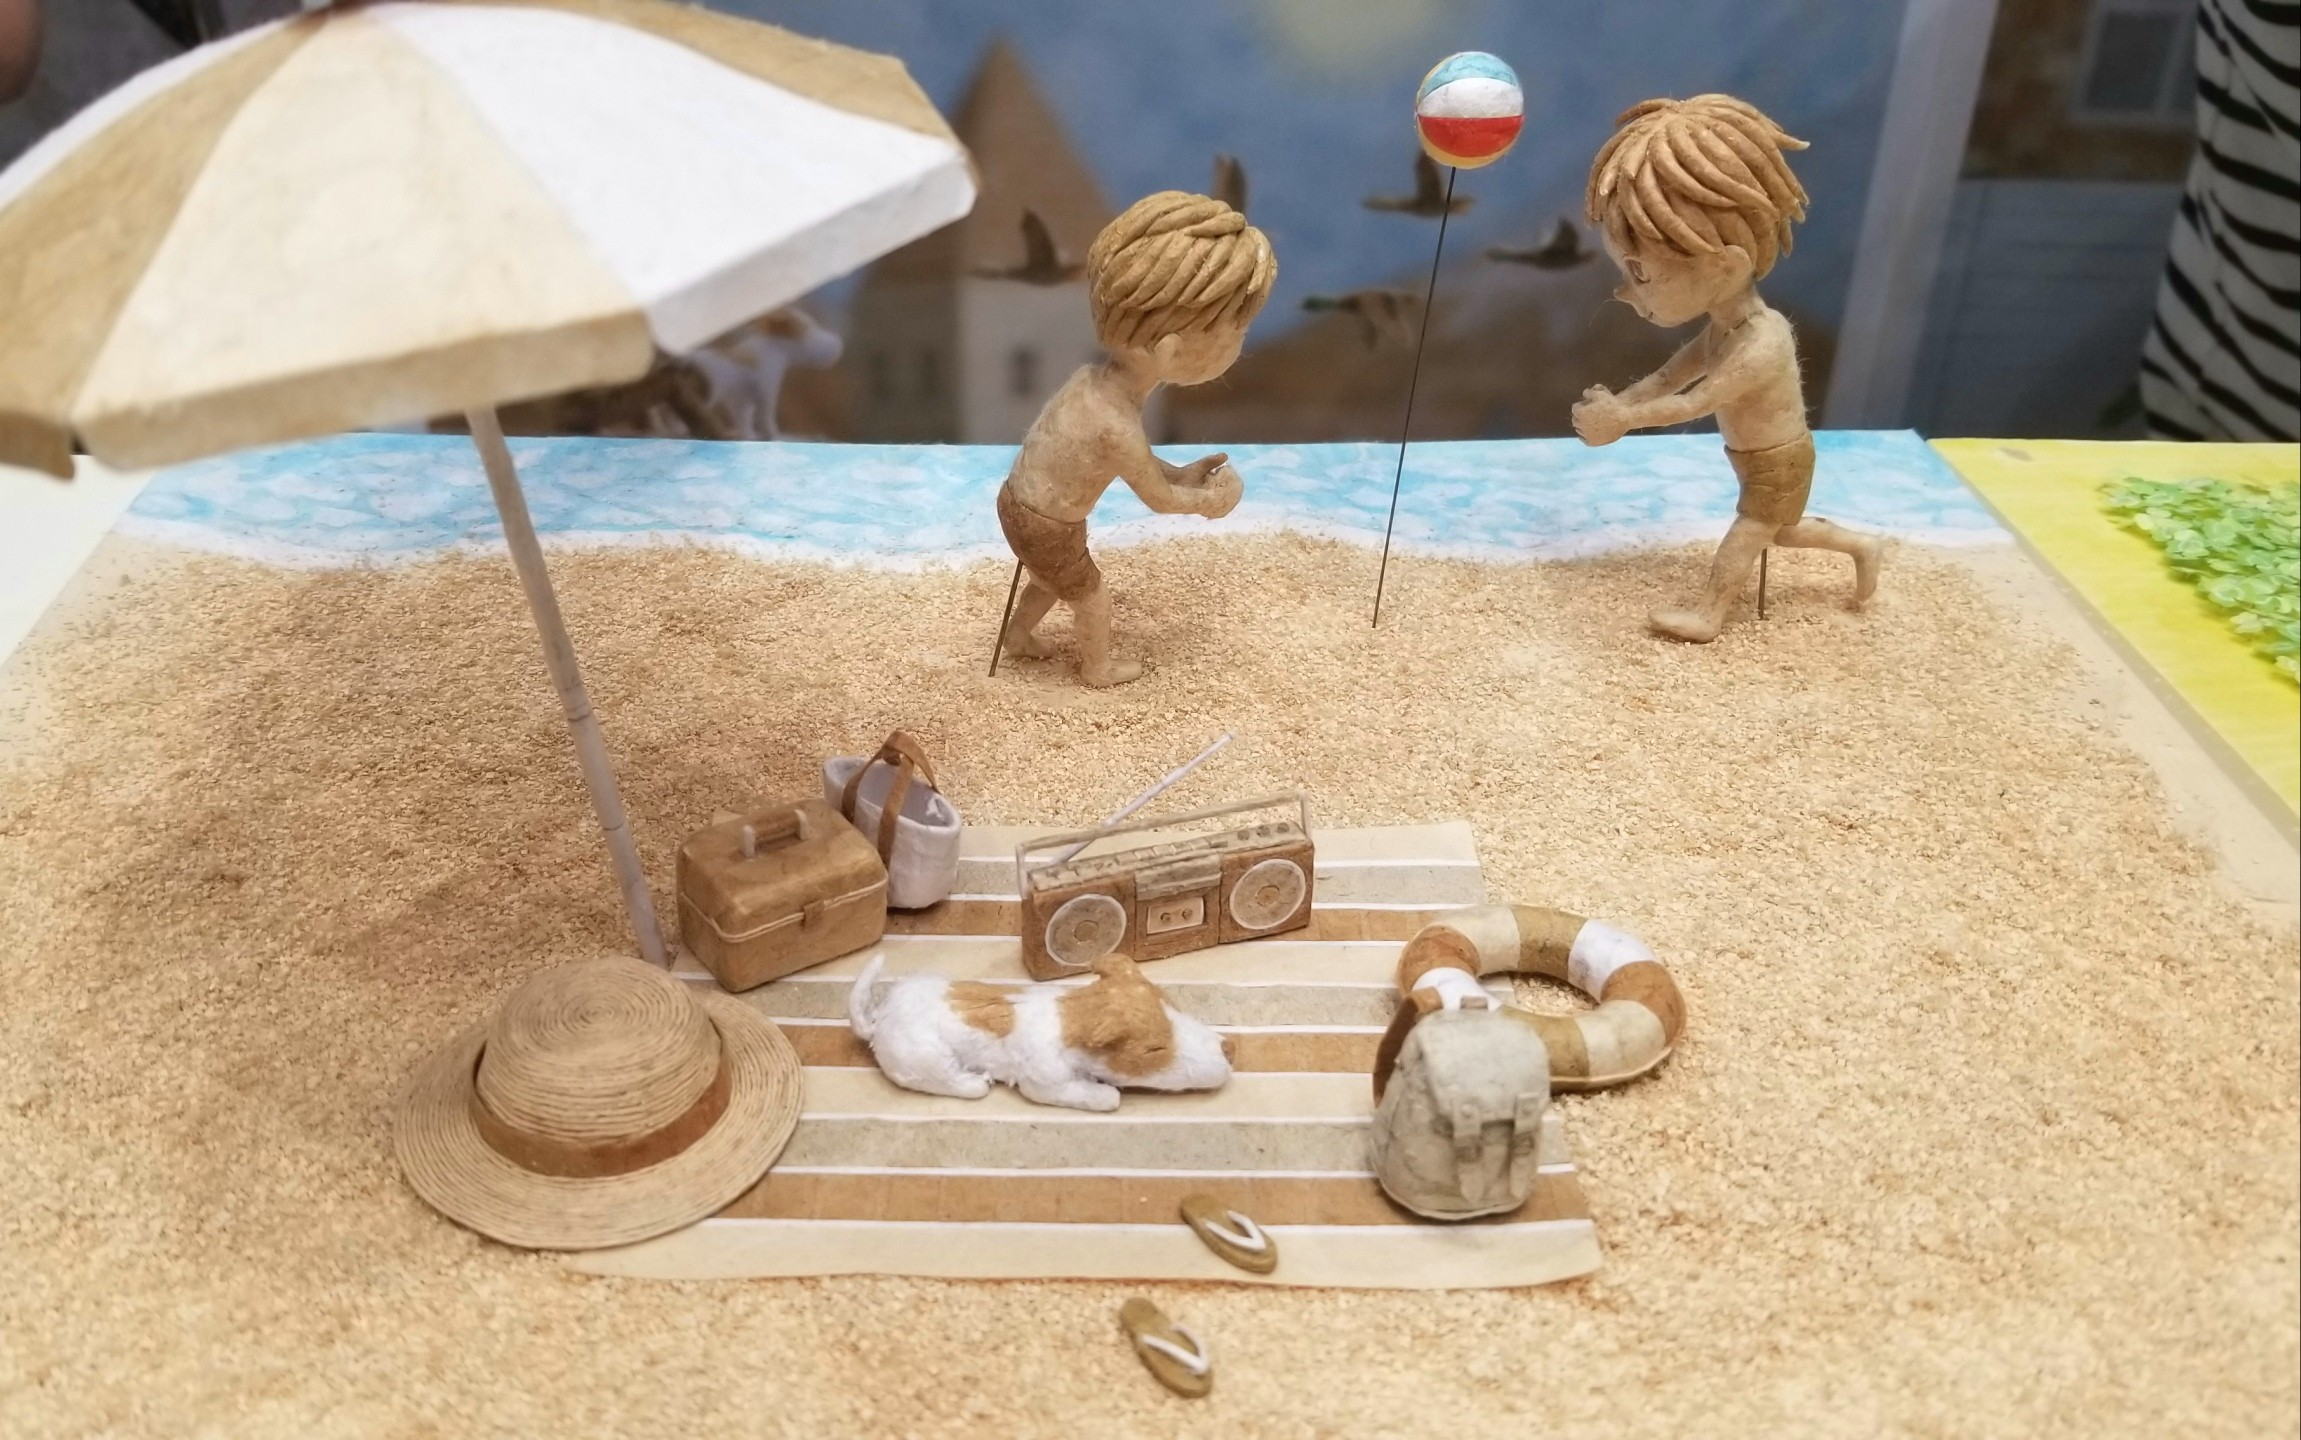 KazuhiroKanazawa,ミニチュア, 海水浴,砂浜,紙アート, ハンドメイド